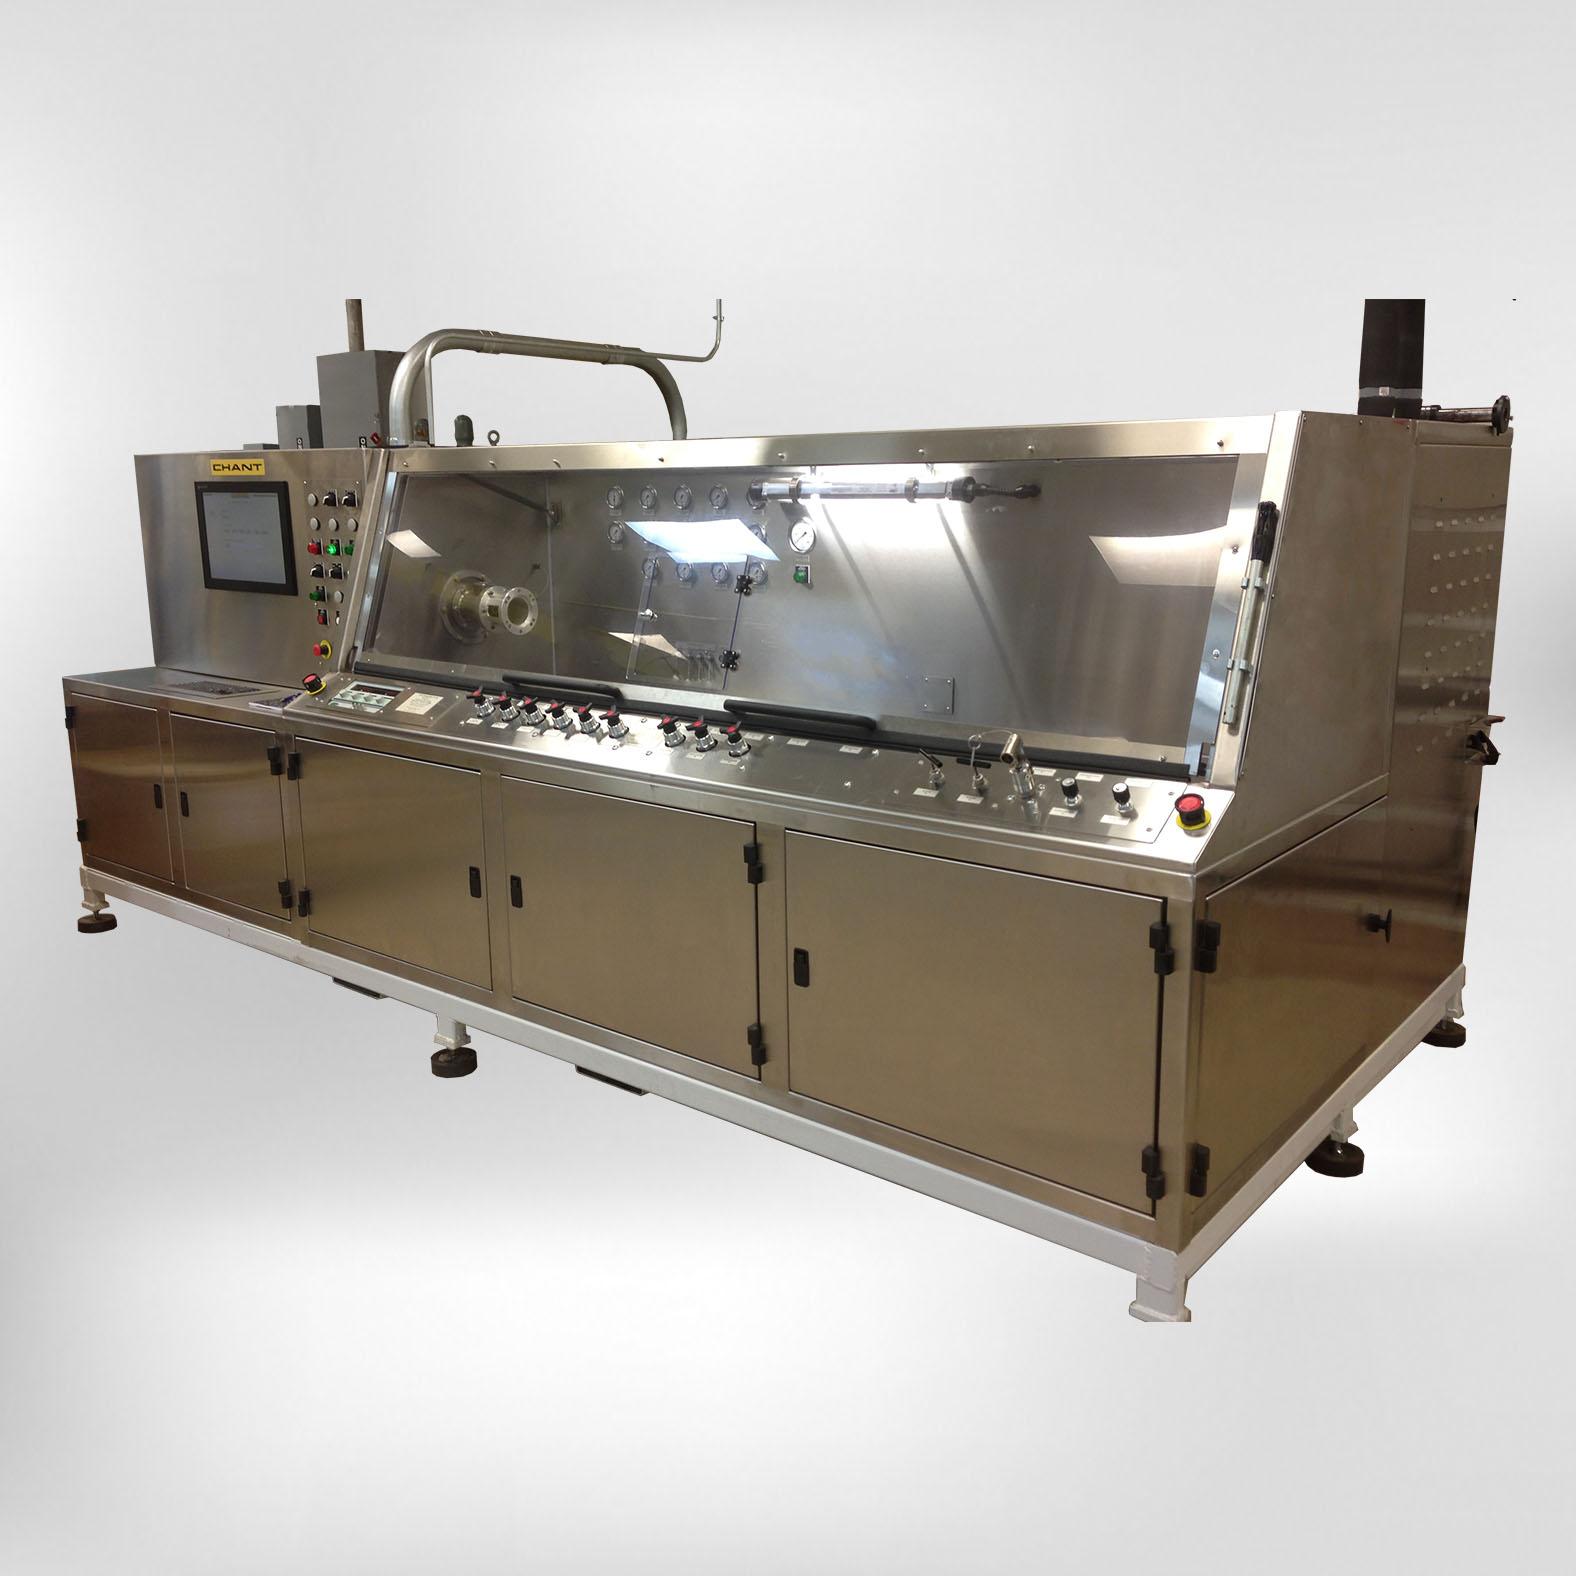 10947-01 Universal OandM Hydraulic Test Stand